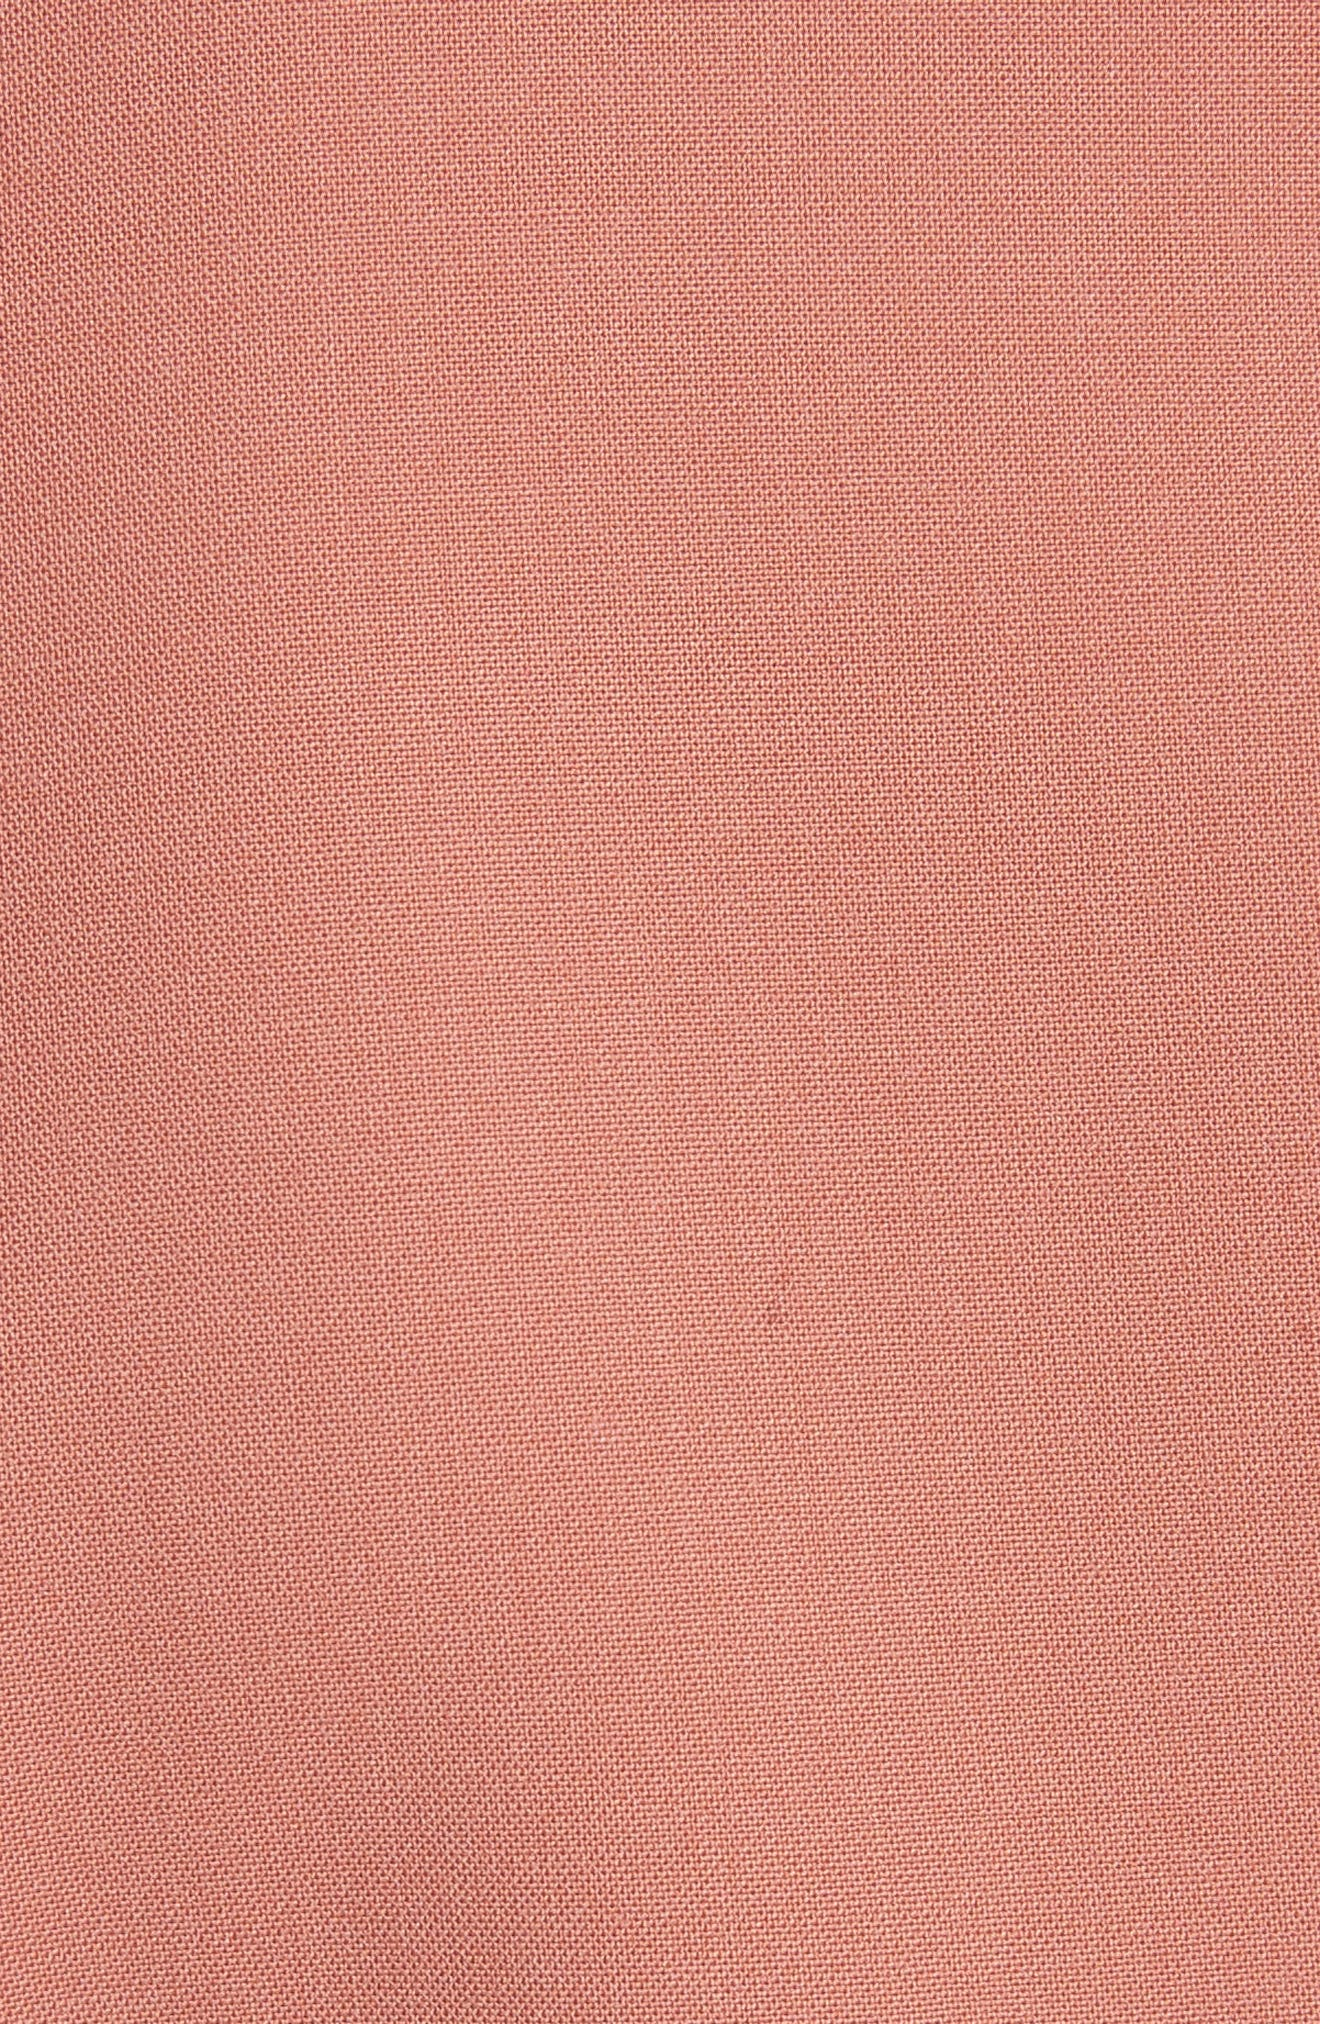 Etienette B Good Wool Suit Jacket,                             Alternate thumbnail 44, color,